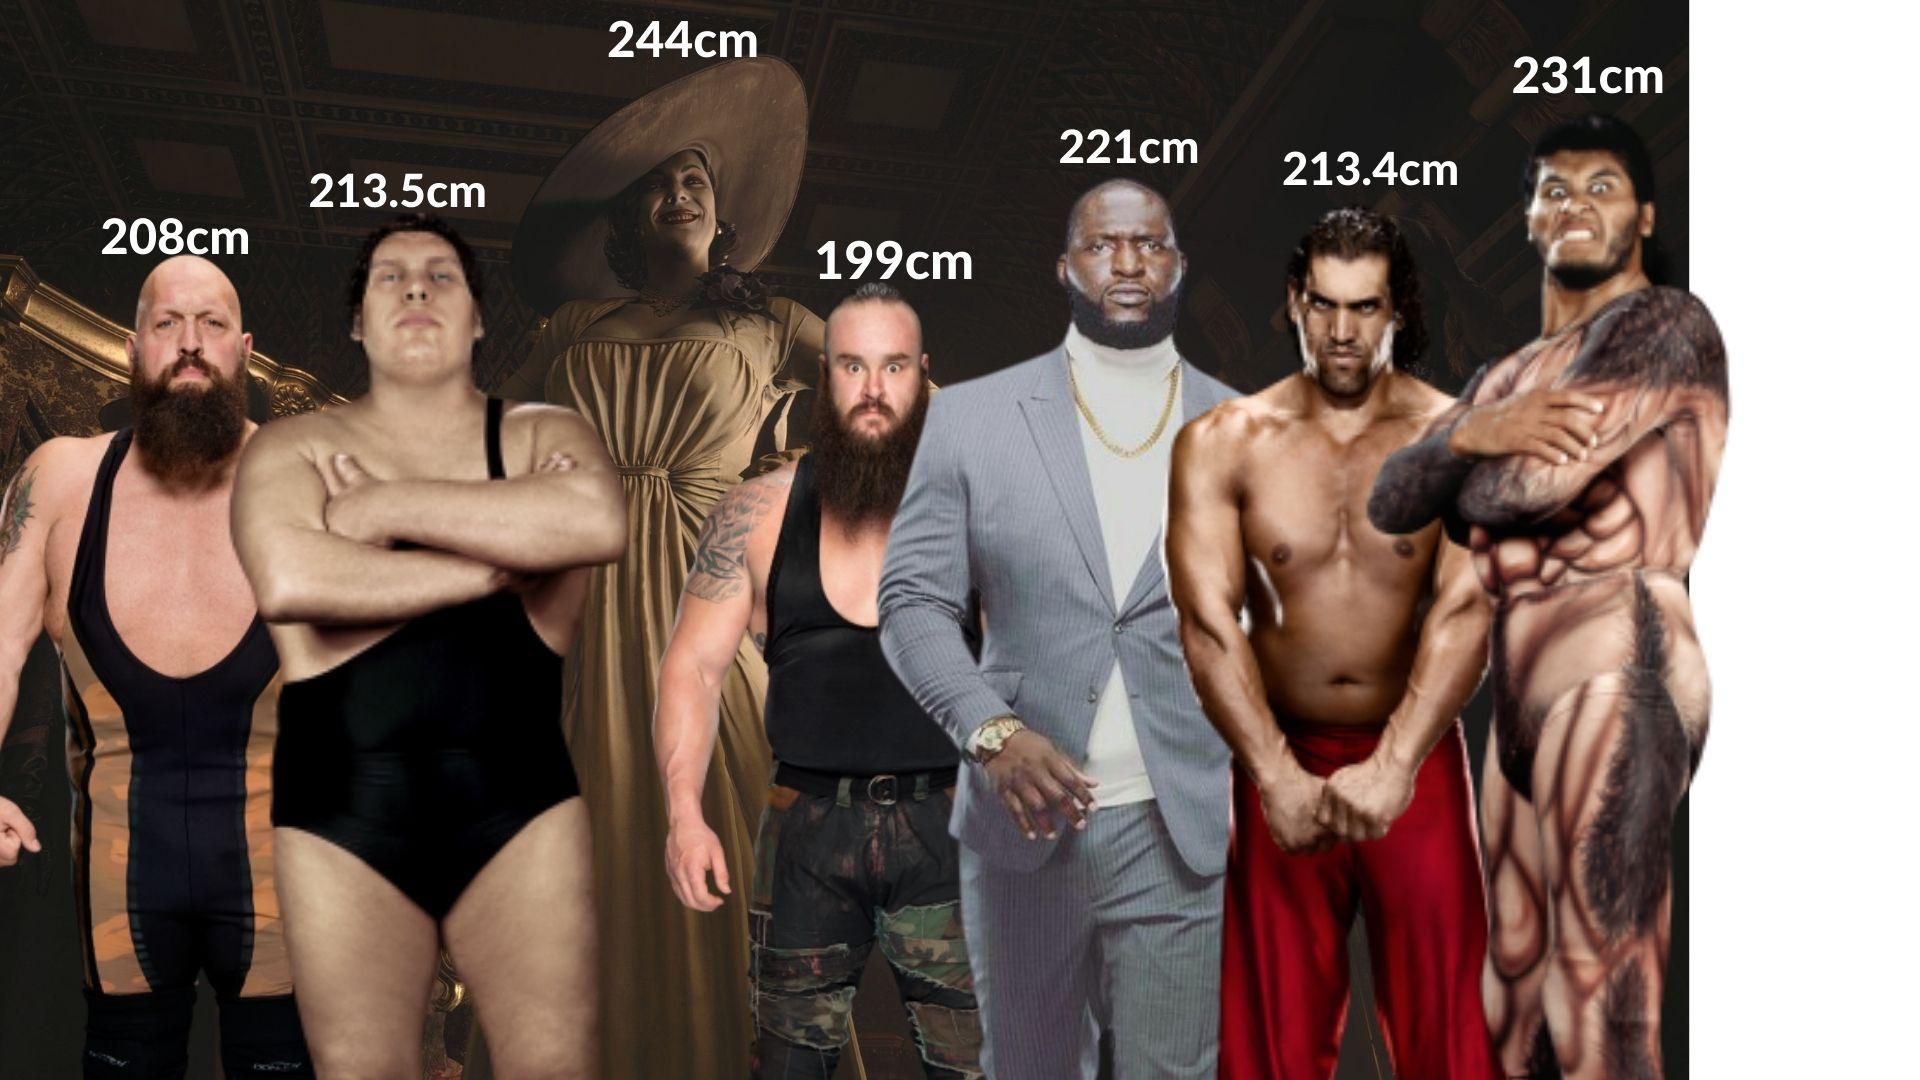 208cm